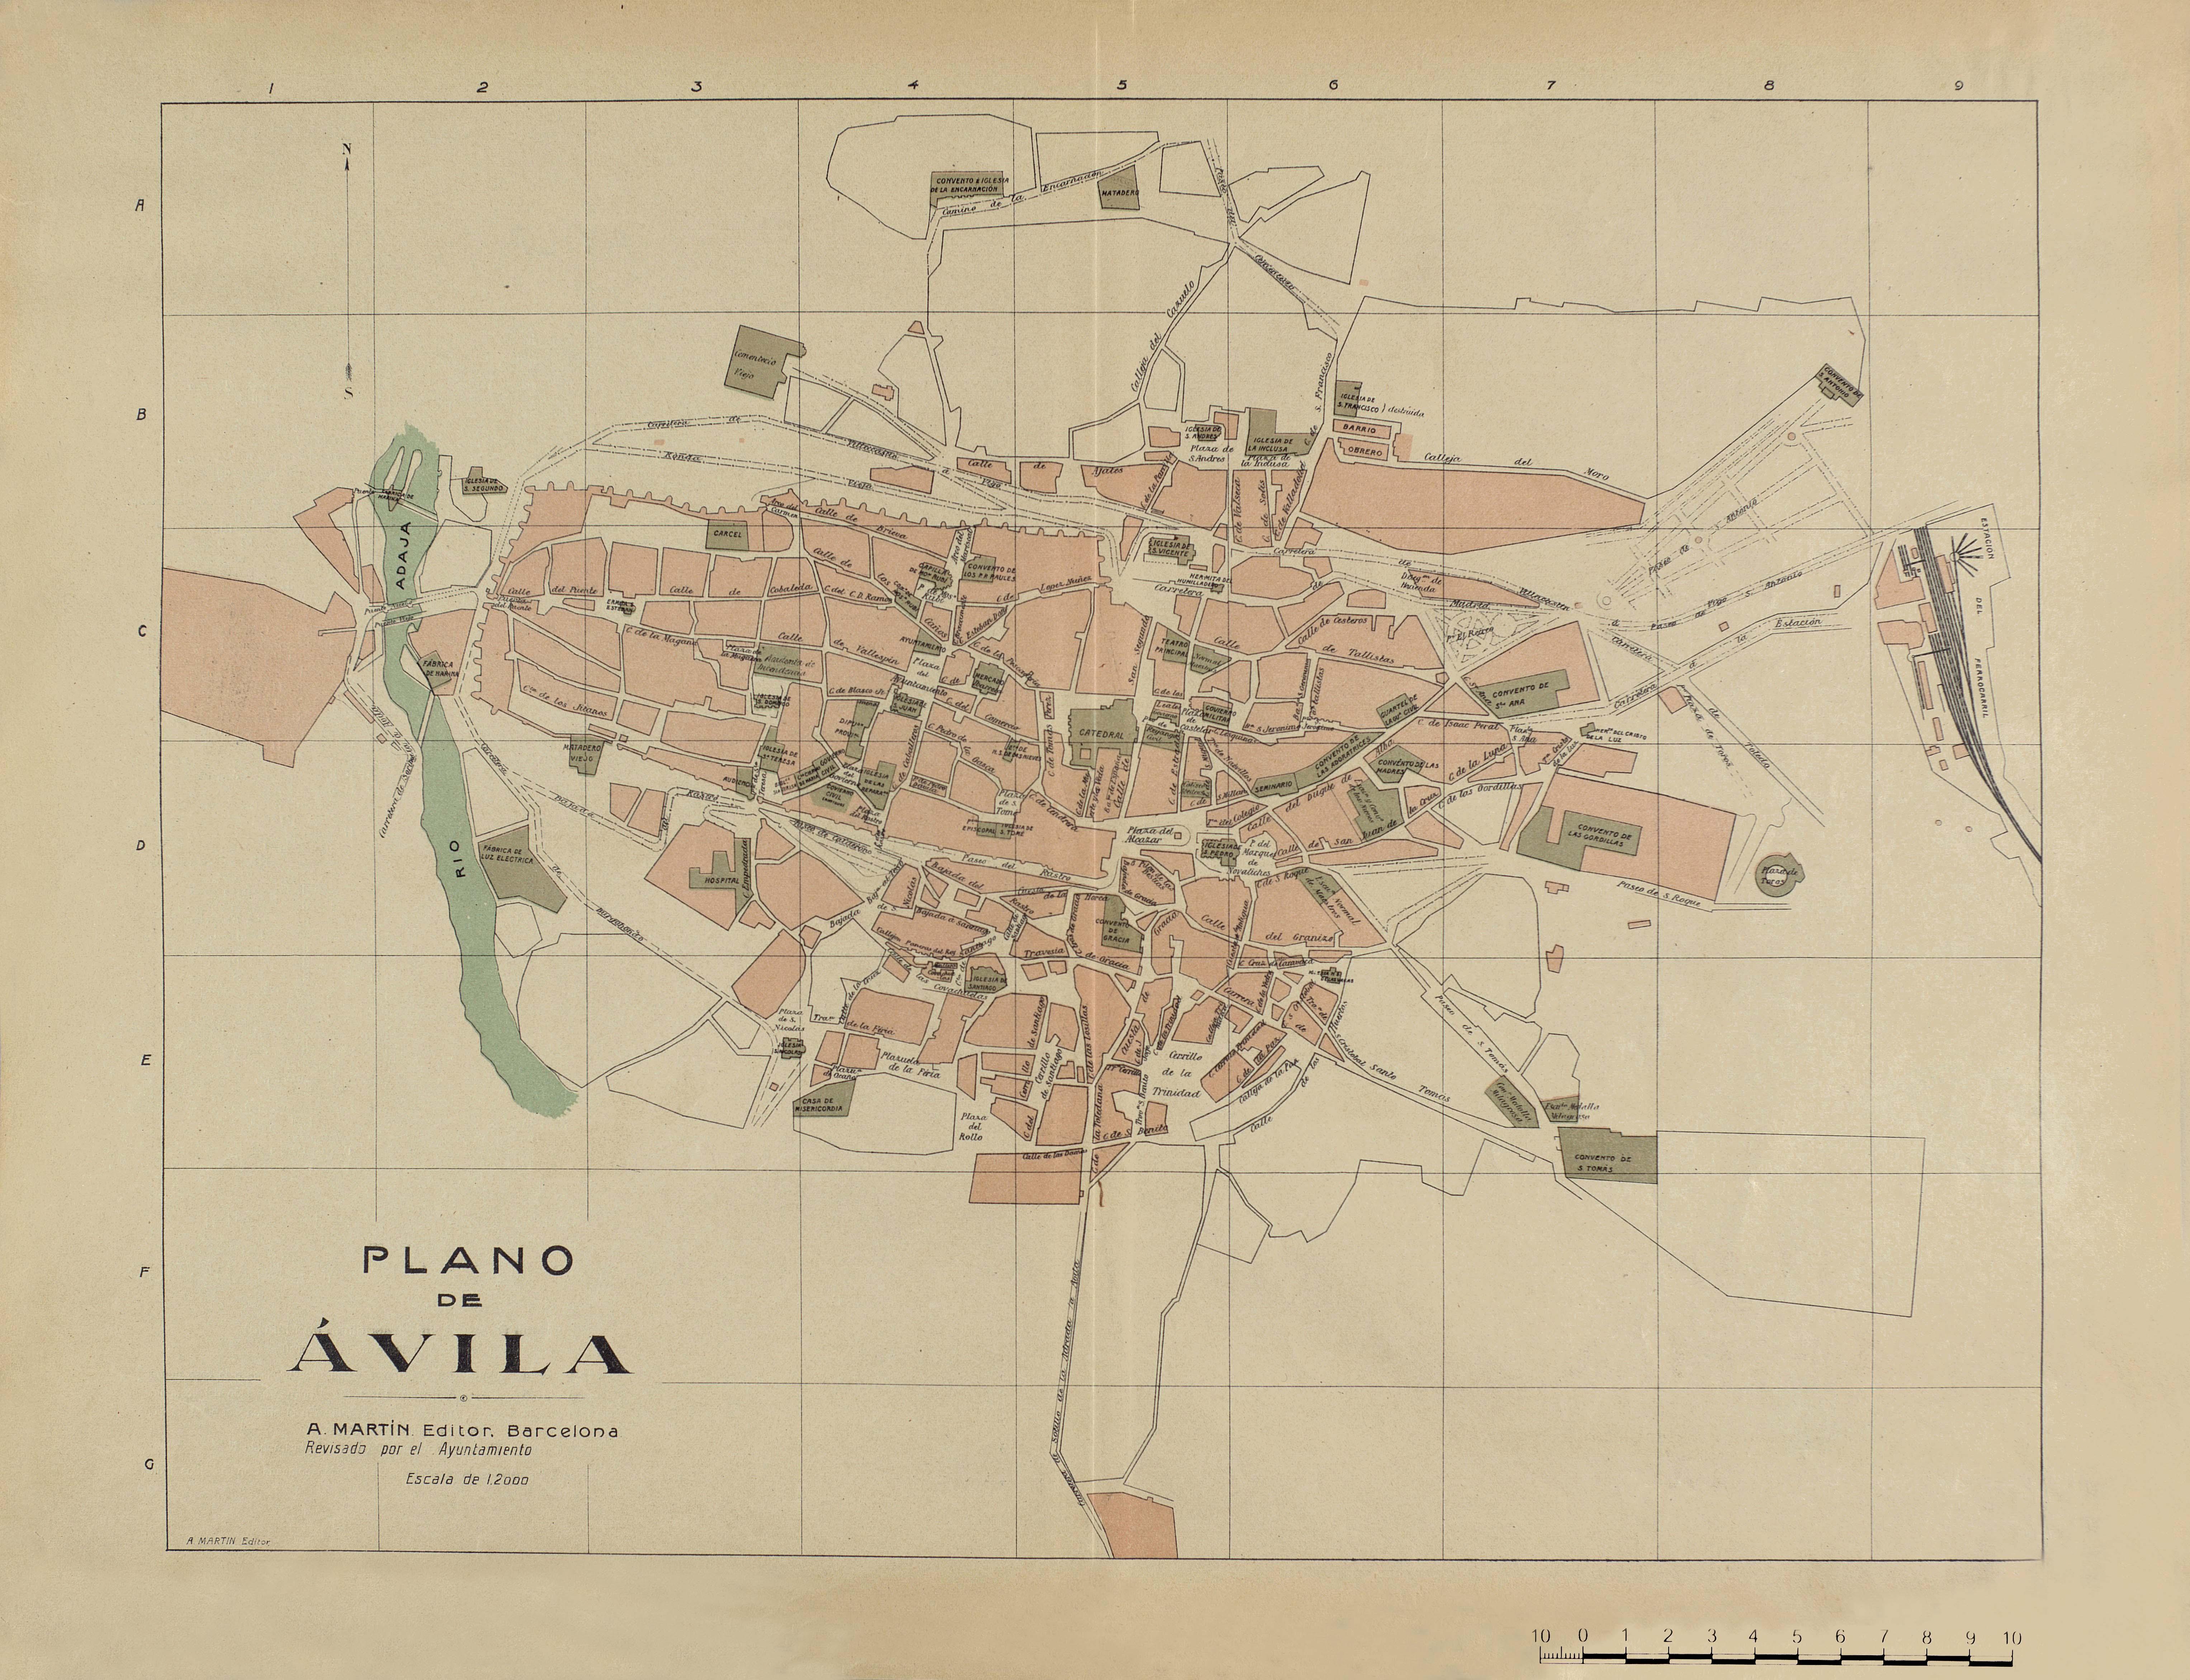 Plano de Ávila